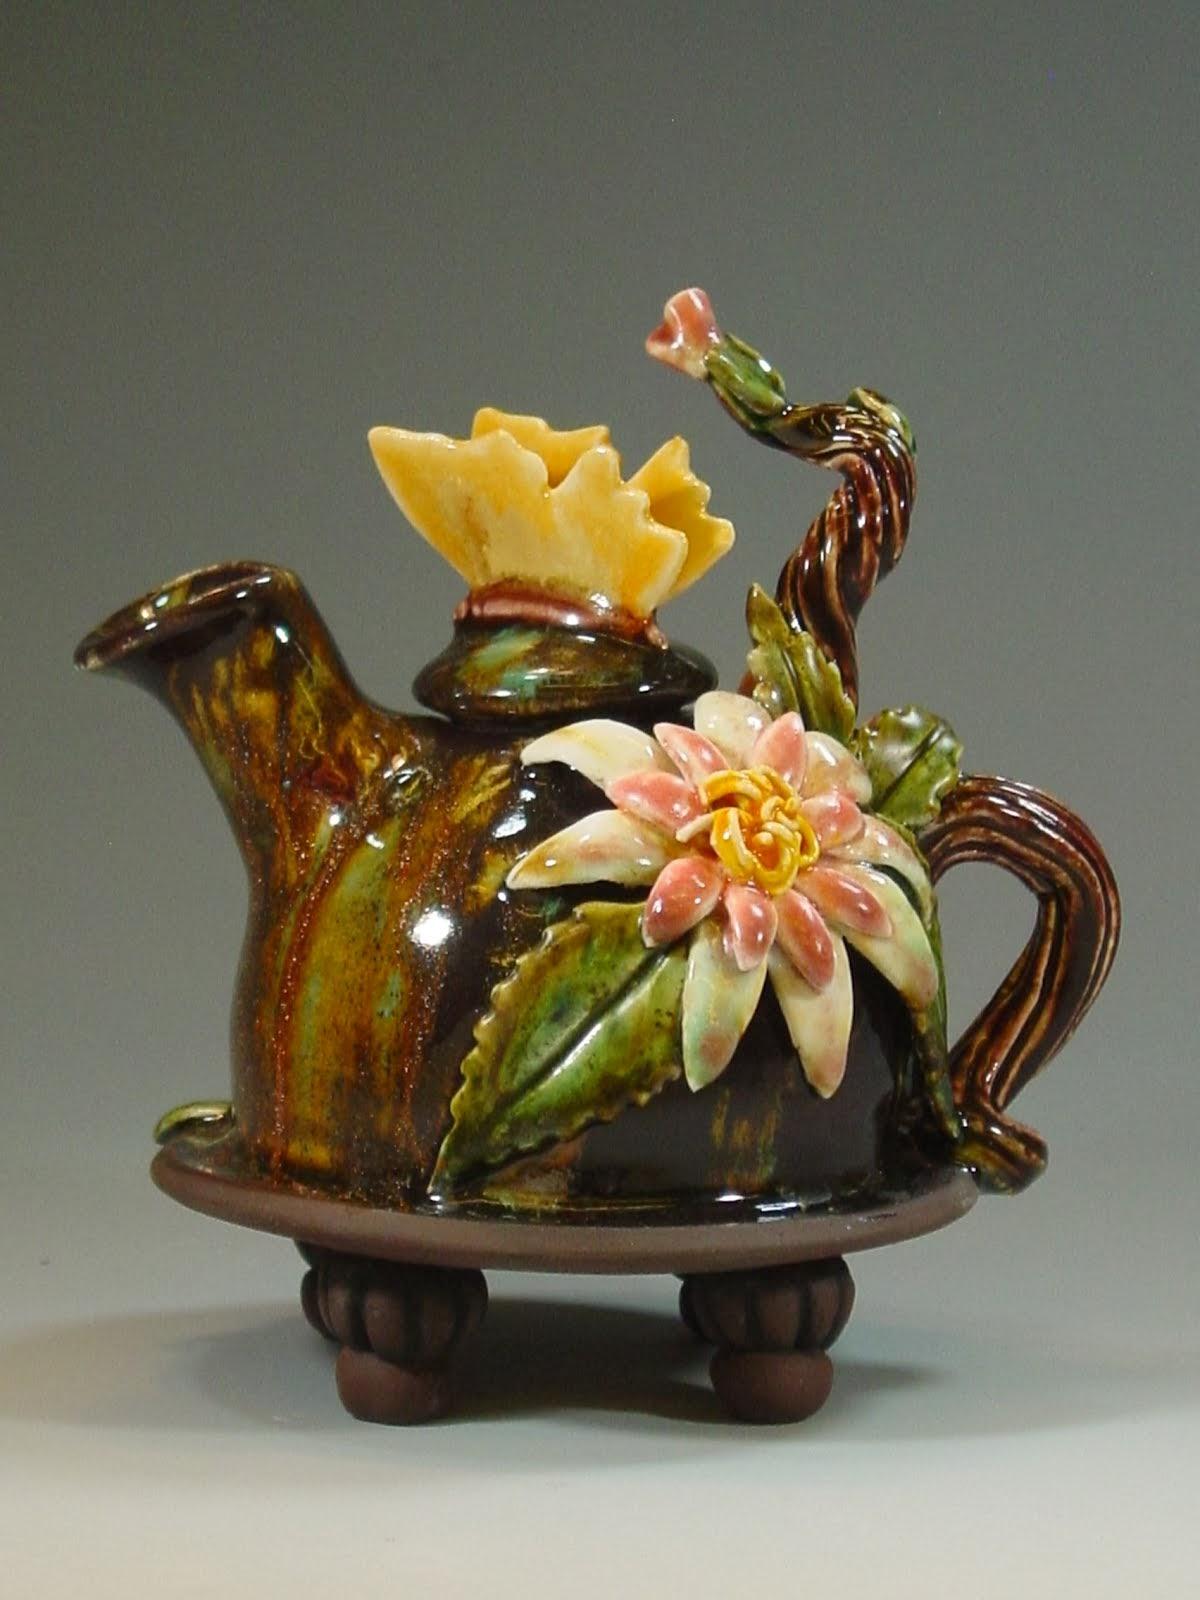 Flower & Butterfly on Sparkly Jewel Glaze